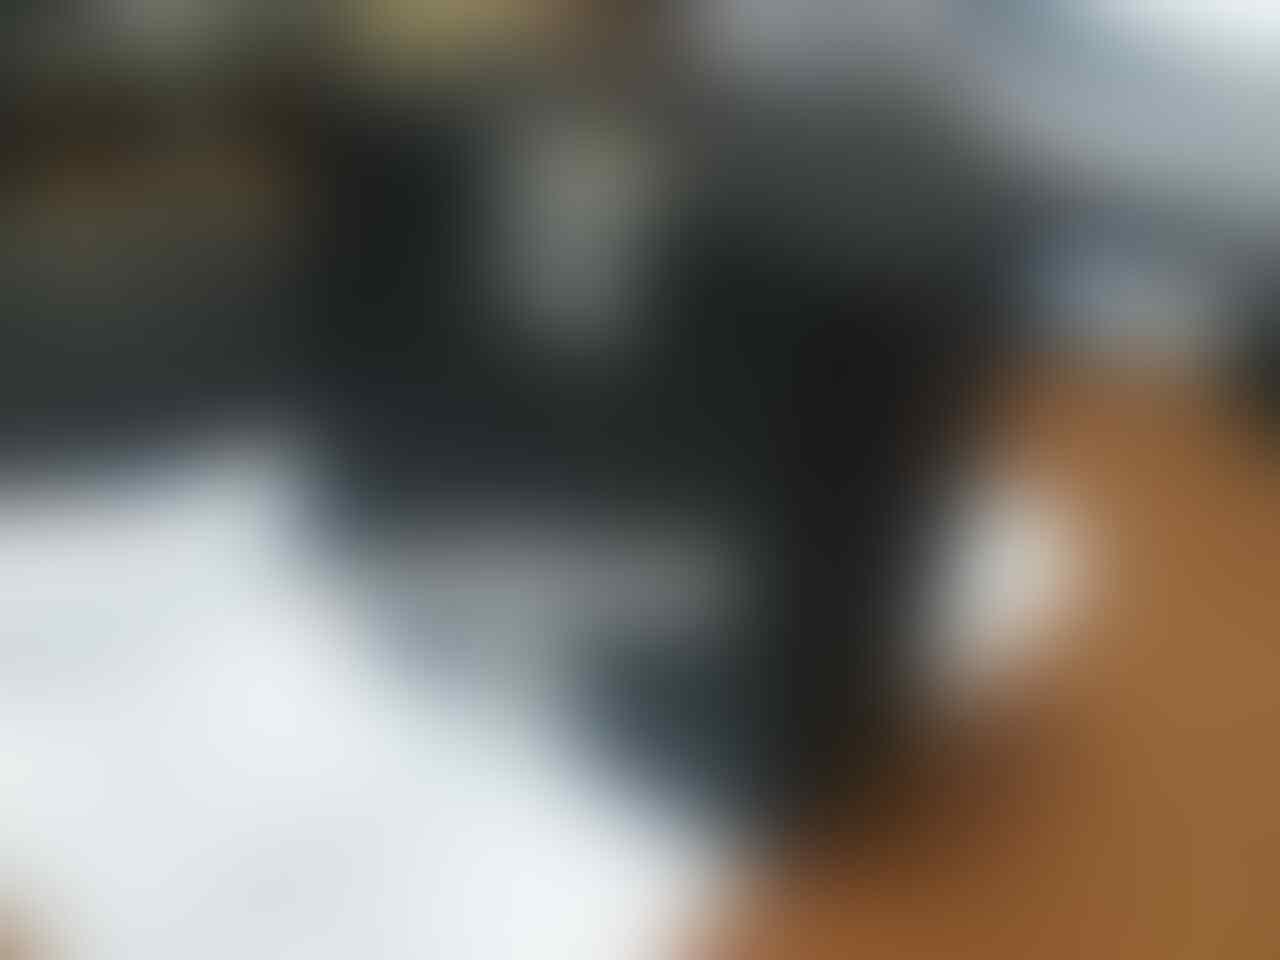 dakota 9900 black, new dari hadiah grs berindo (SURABAYA).. meriah aja